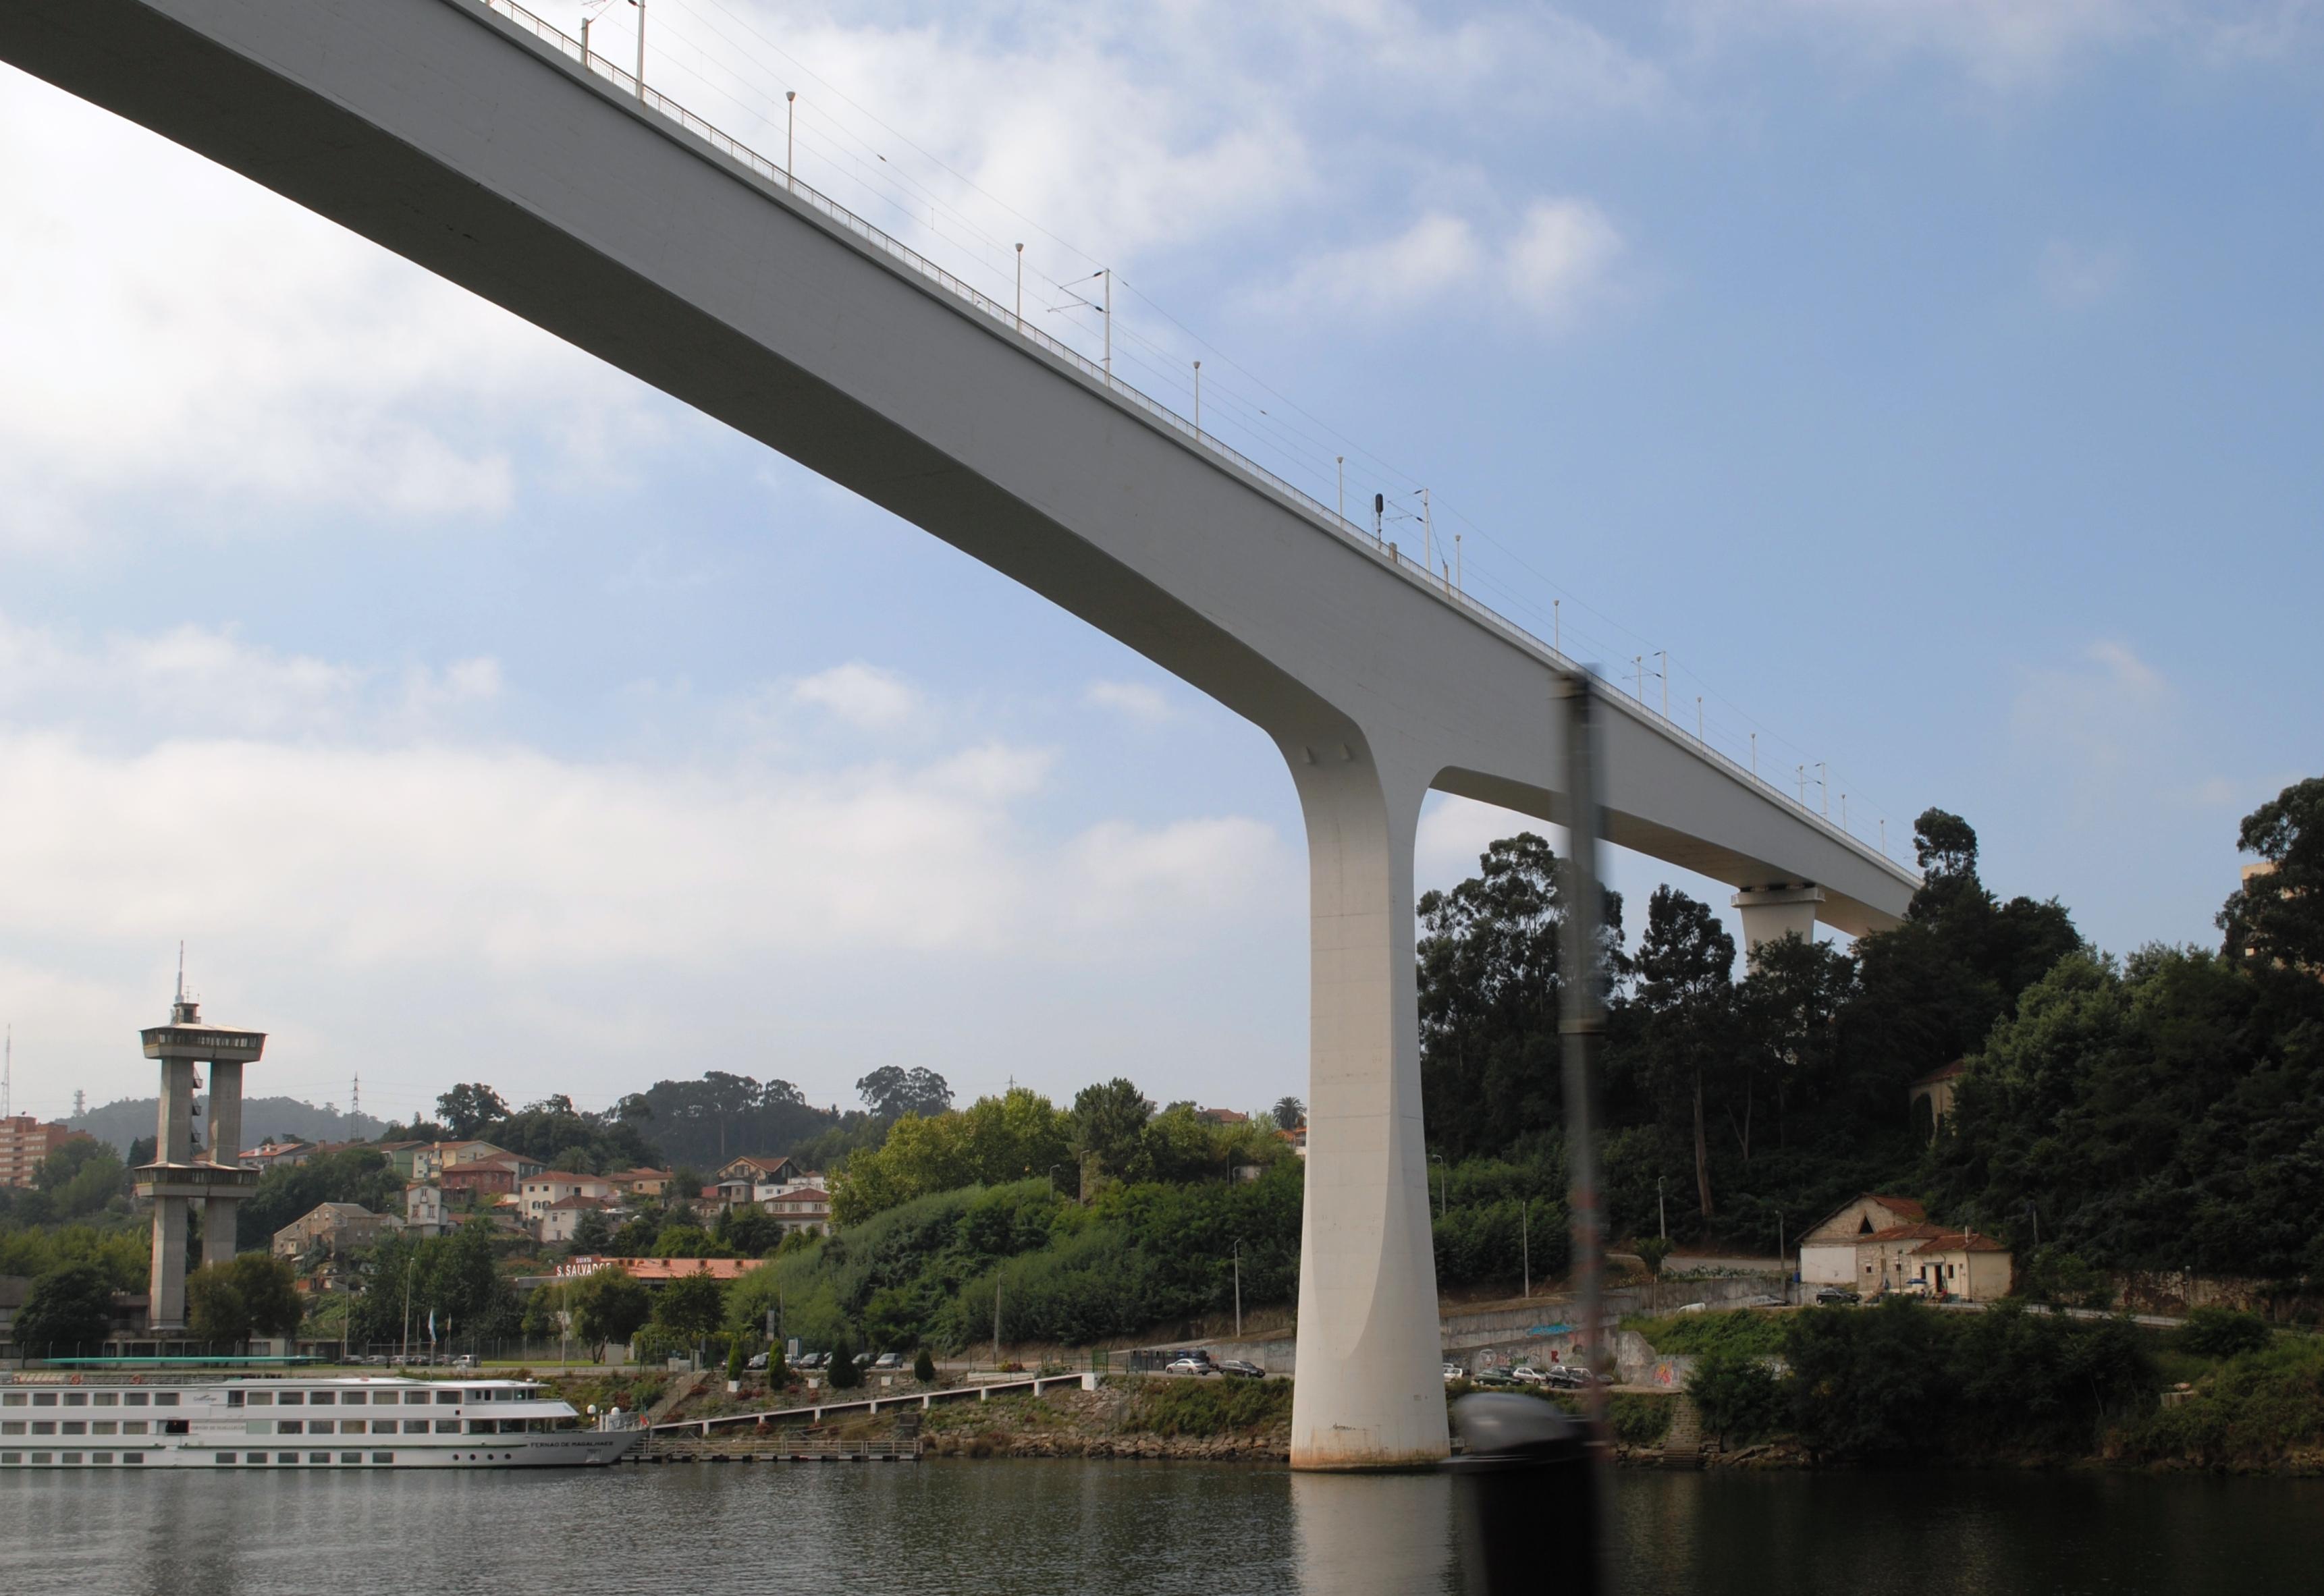 Ponte S. Joao